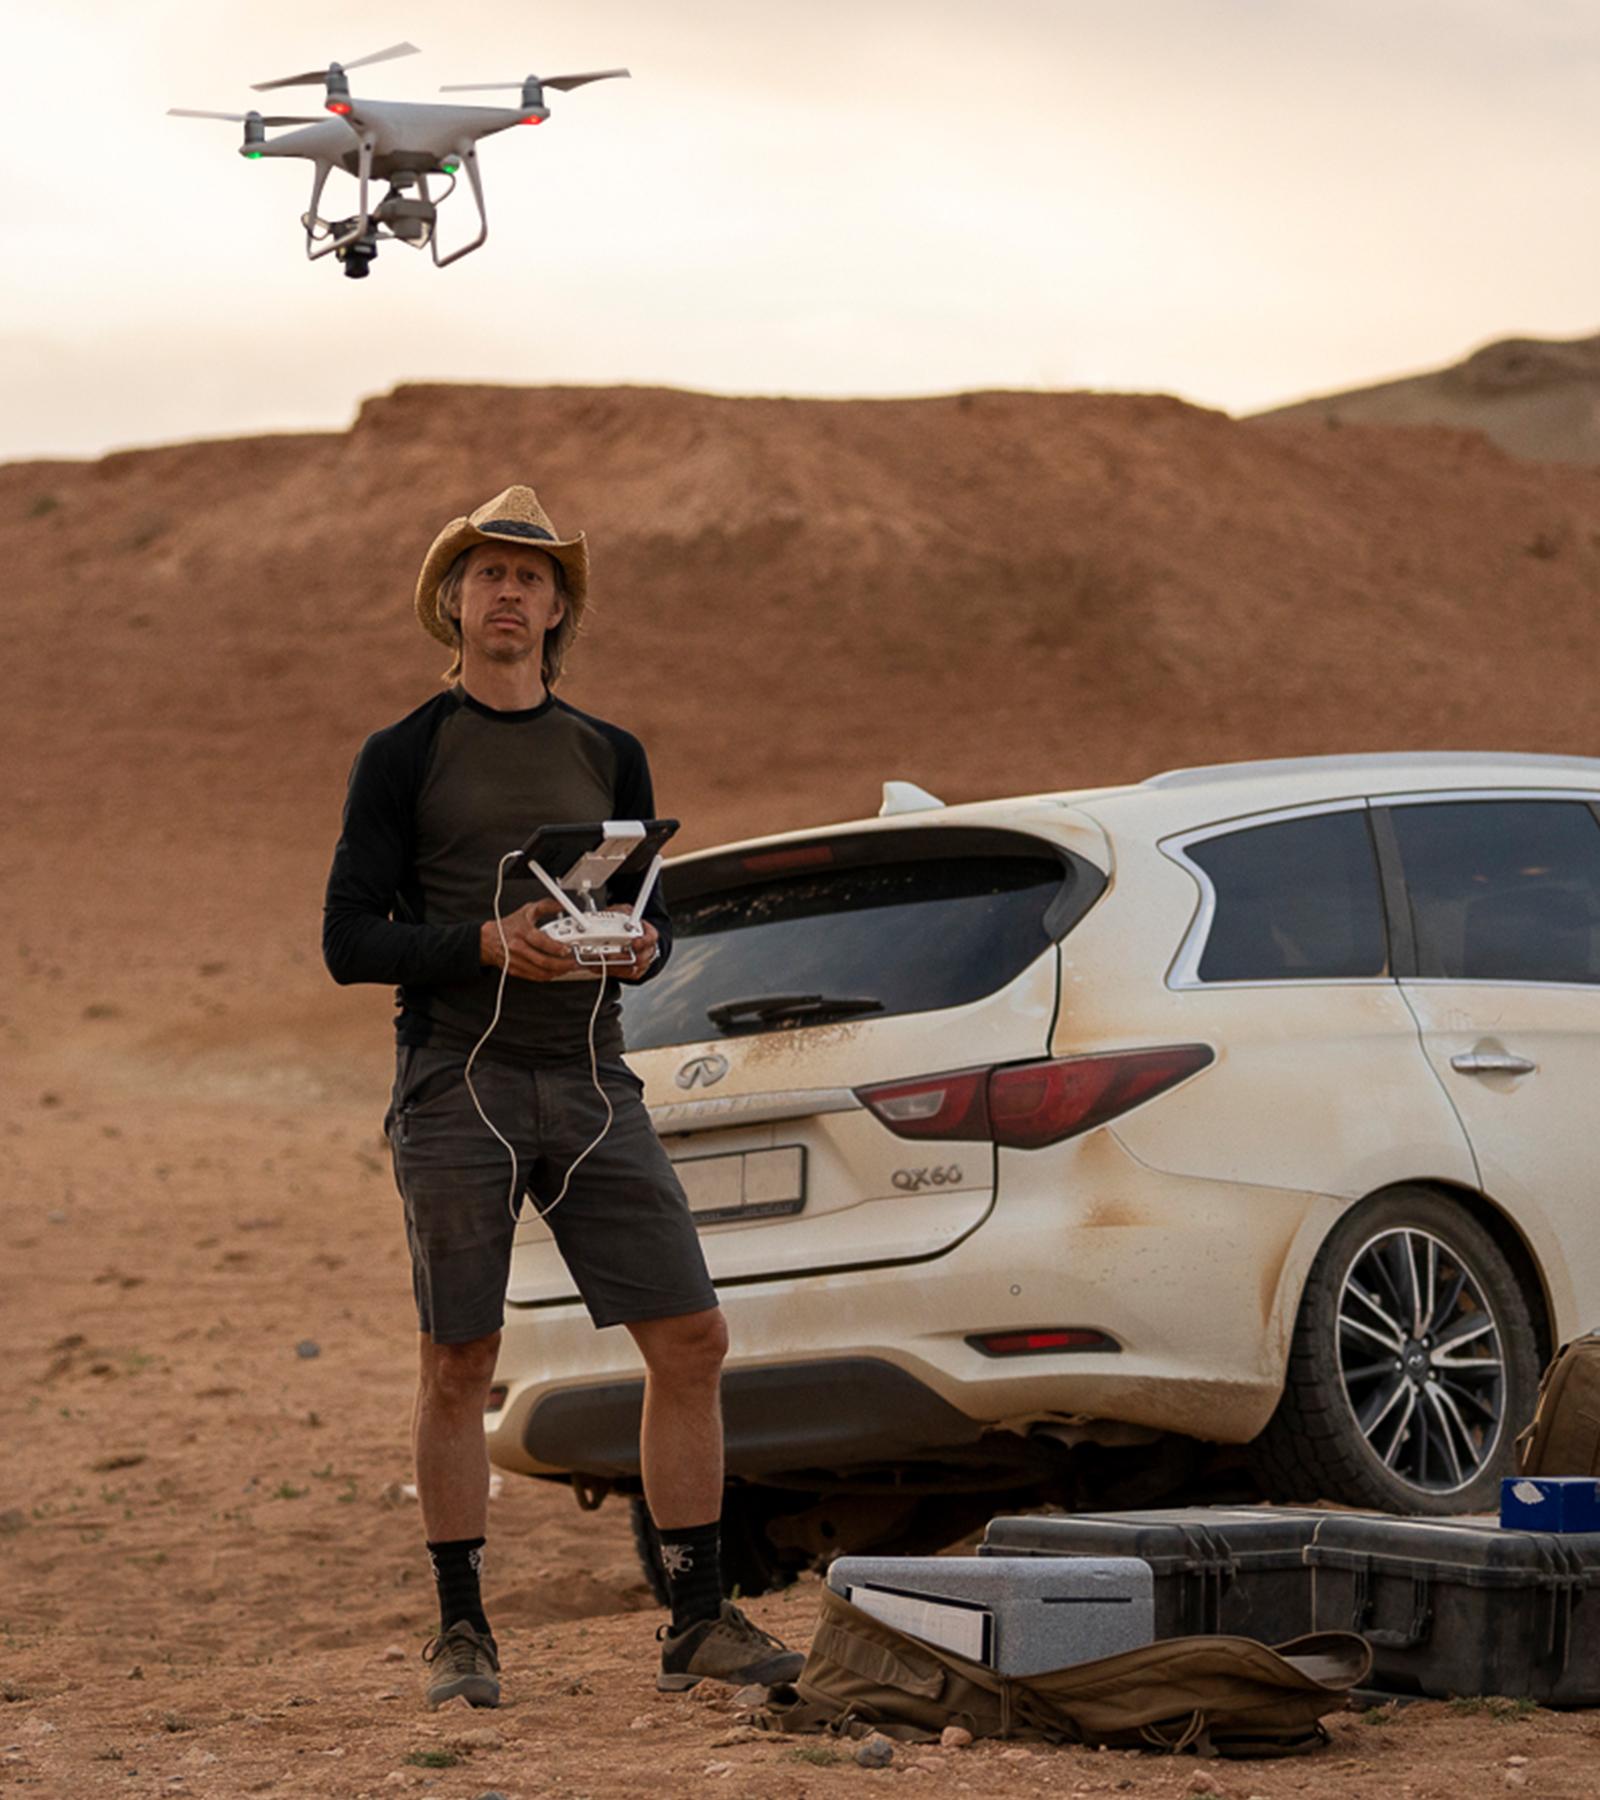 INFINITI QX Series use new technologies in Gobi Desert